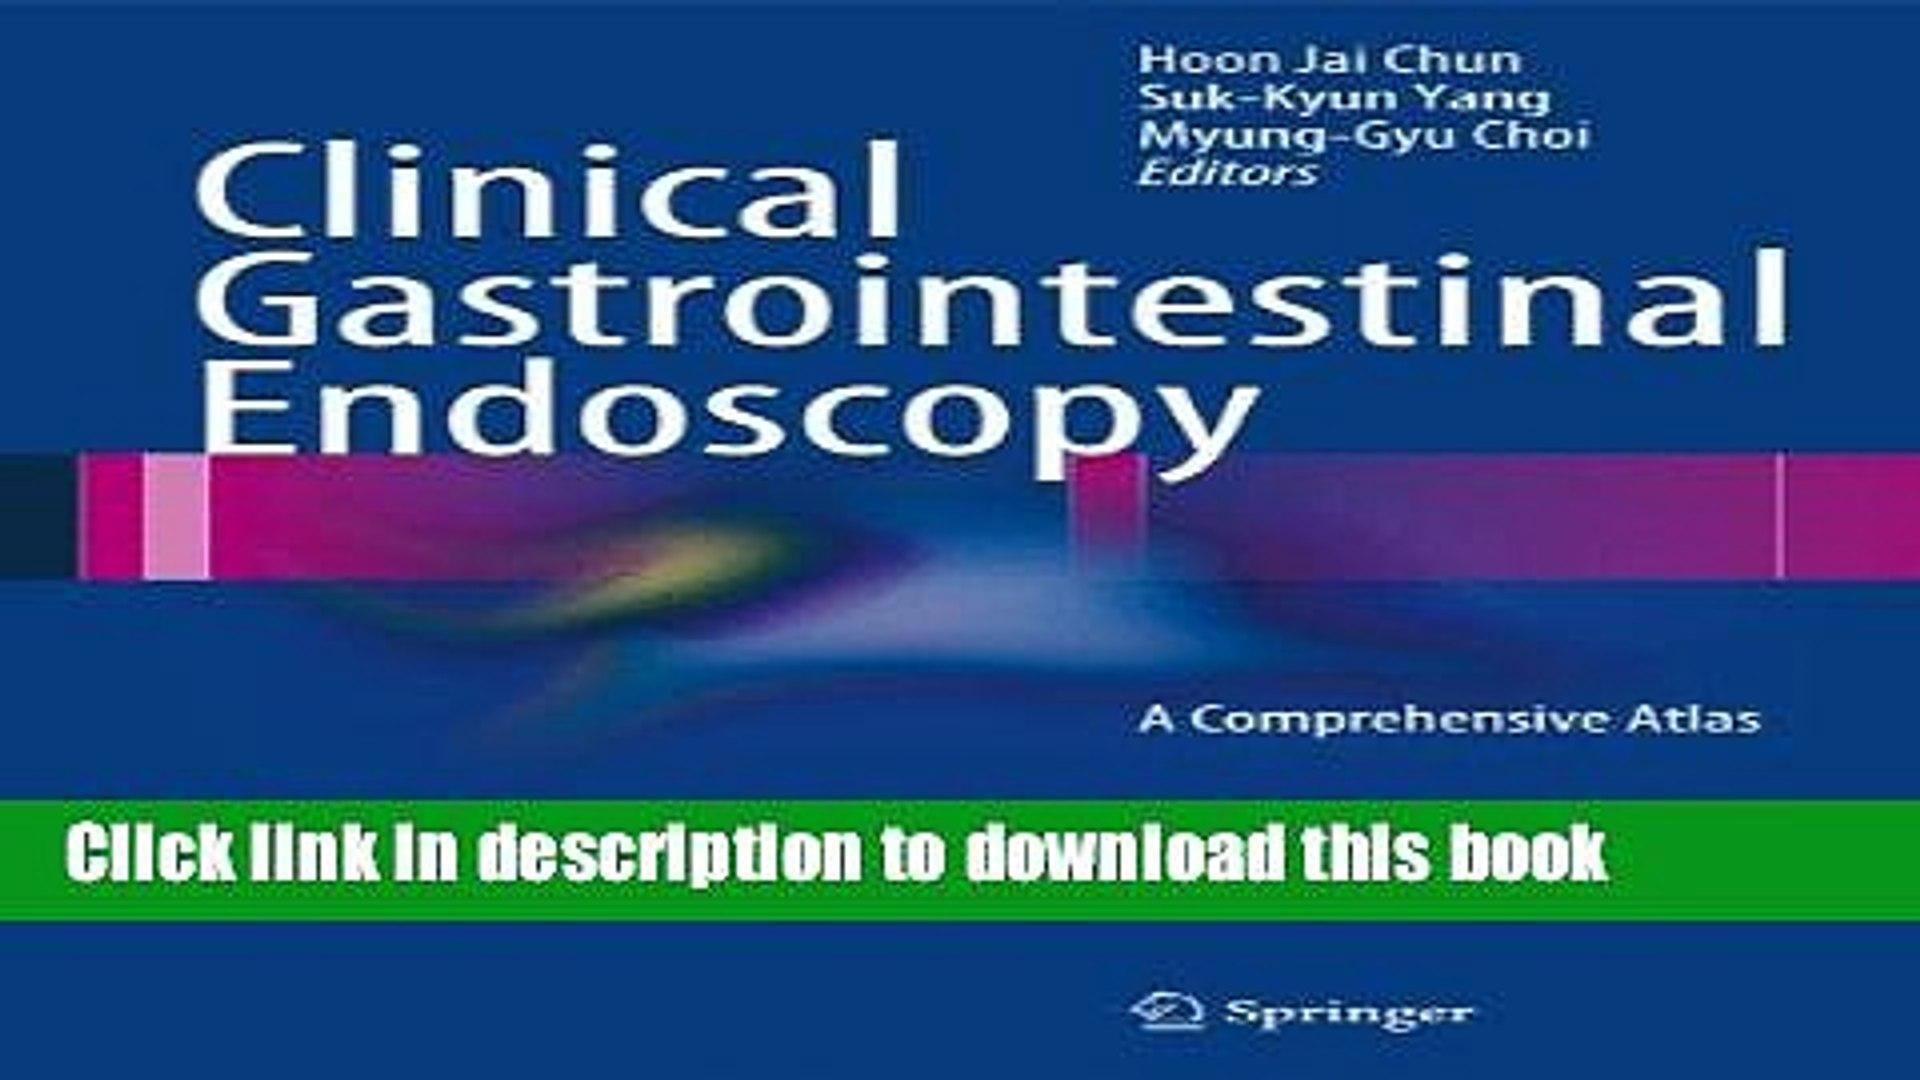 Clinical Gastrointestinal Endoscopy: A Comprehensive Atlas